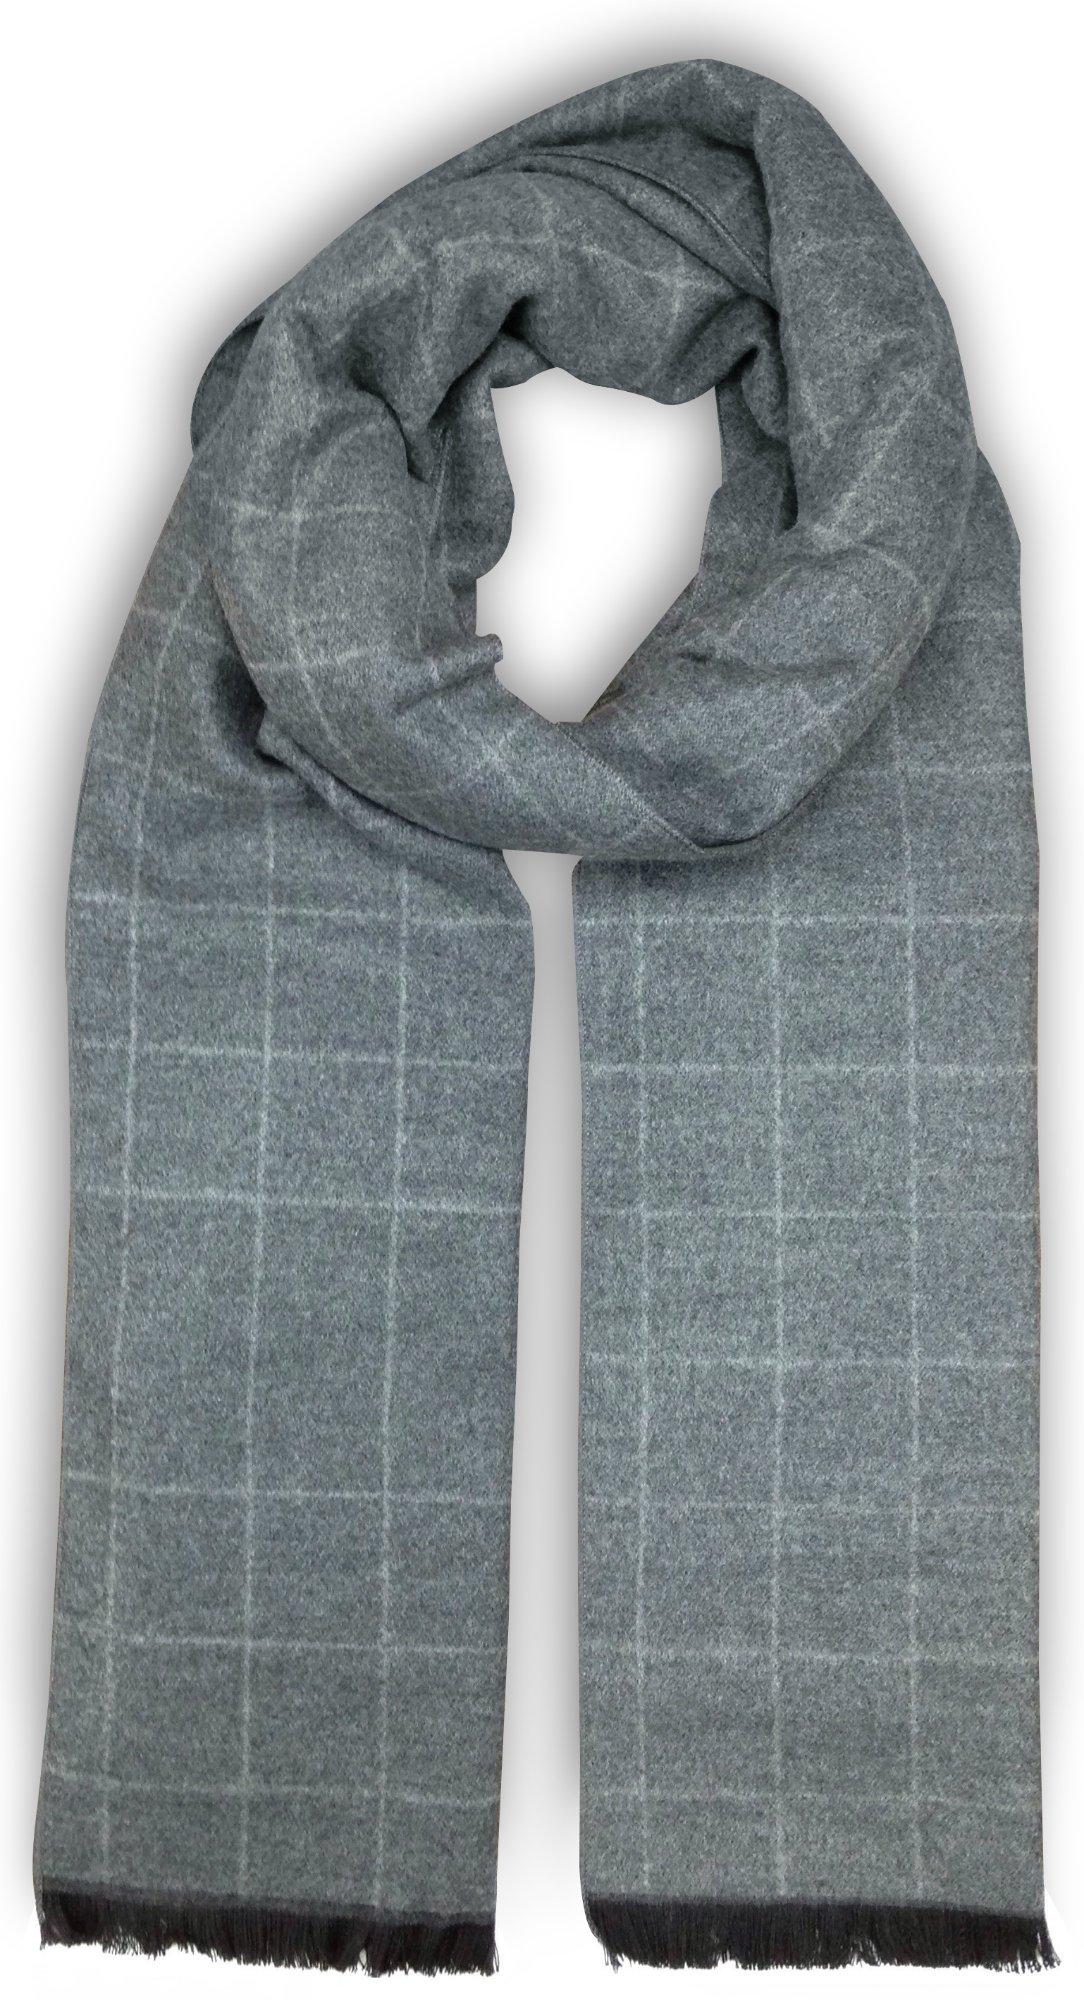 Bleu Nero Luxurious Winter Scarf for Men and Women – Large Selection of Unique Design Scarves – Super Soft Premium Cashmere Feel Grey Light-Grey Grid